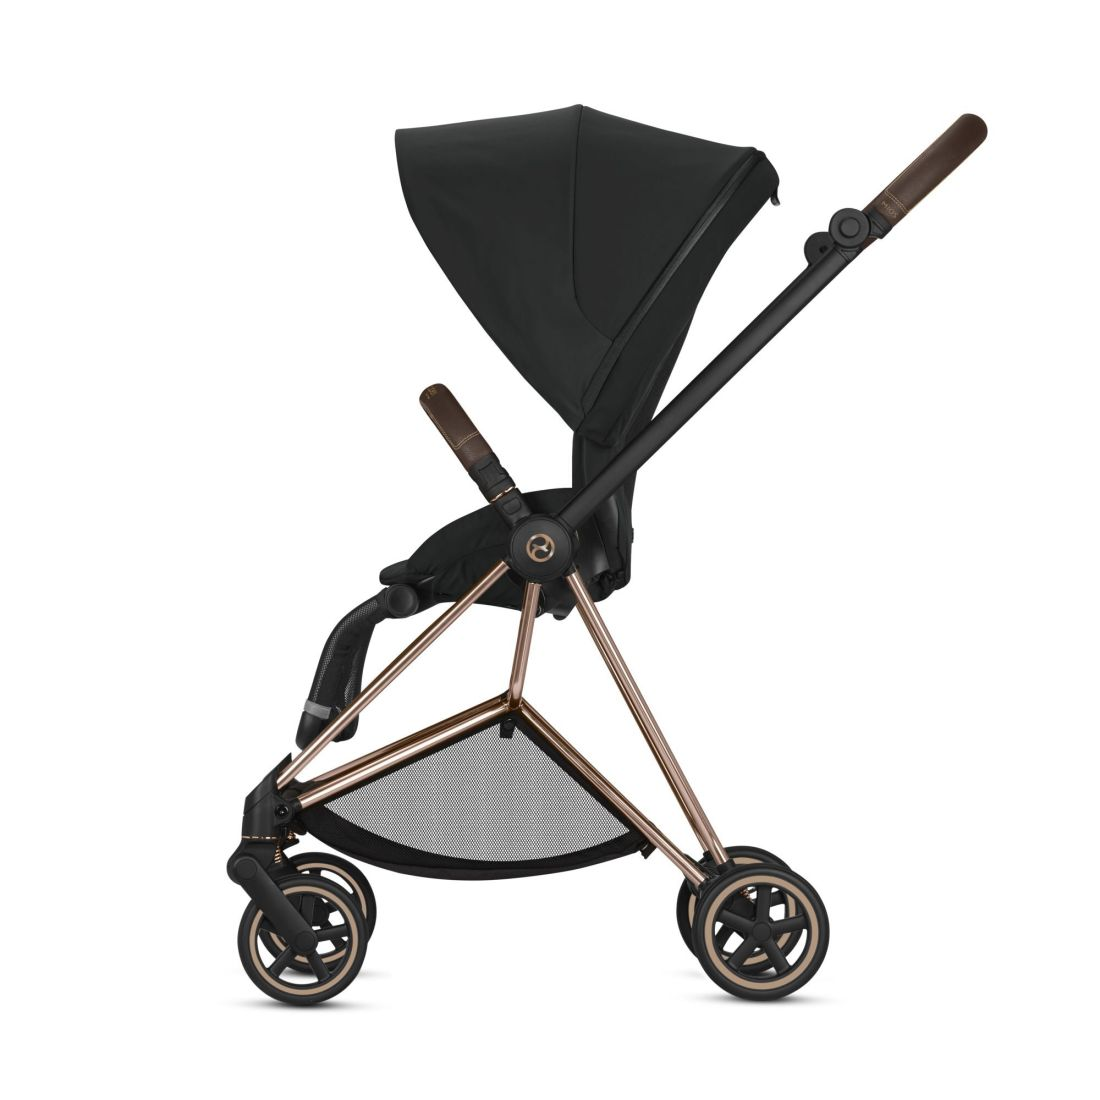 CYBEX MIOS Stroller - Breathable